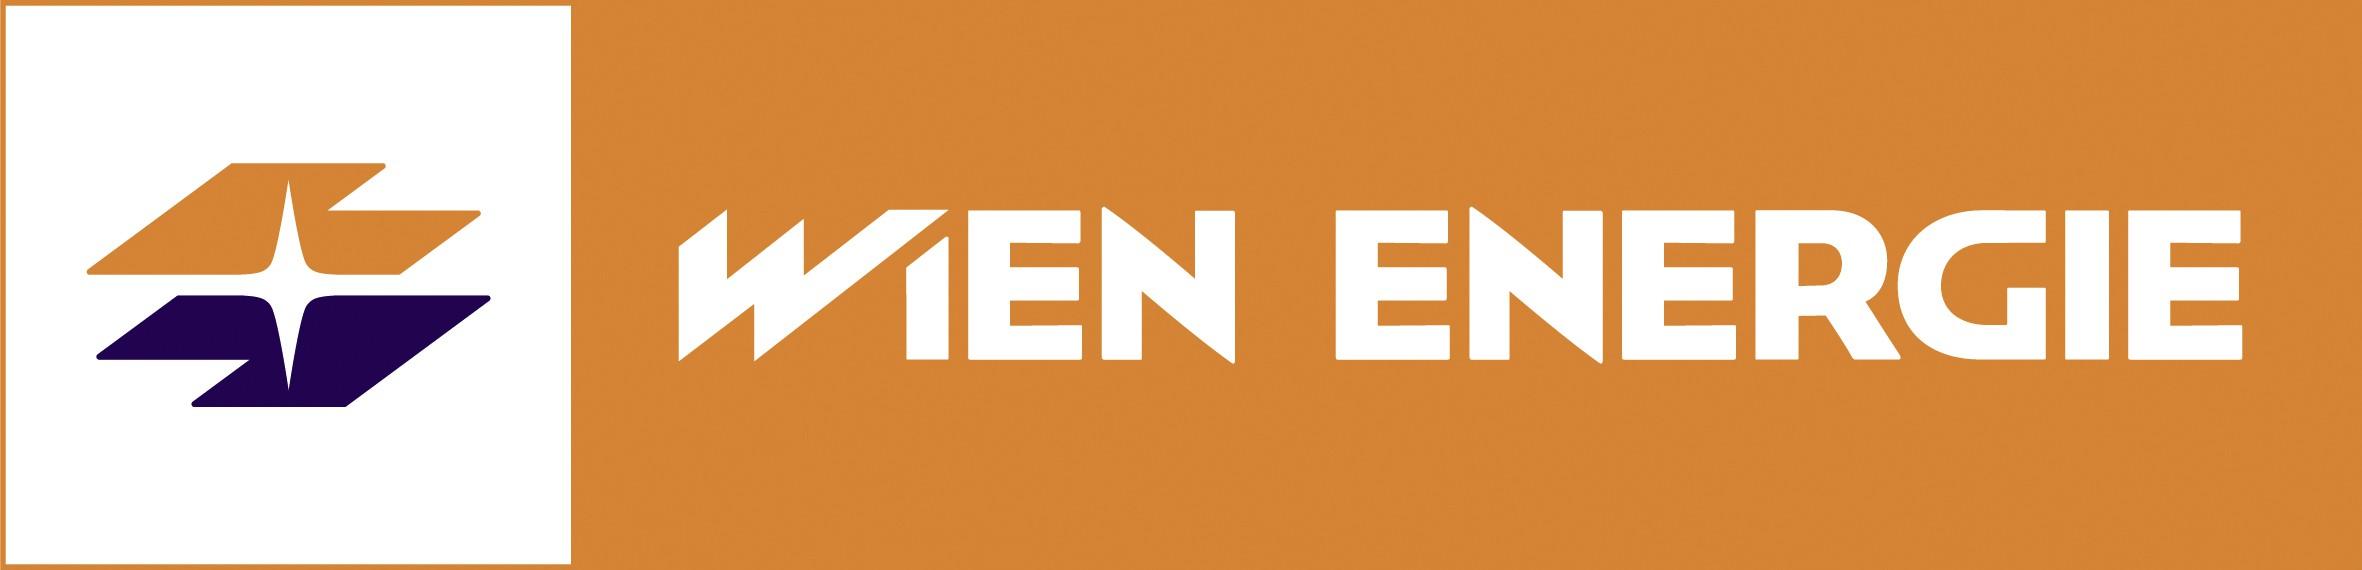 we_rahmen_orange-1